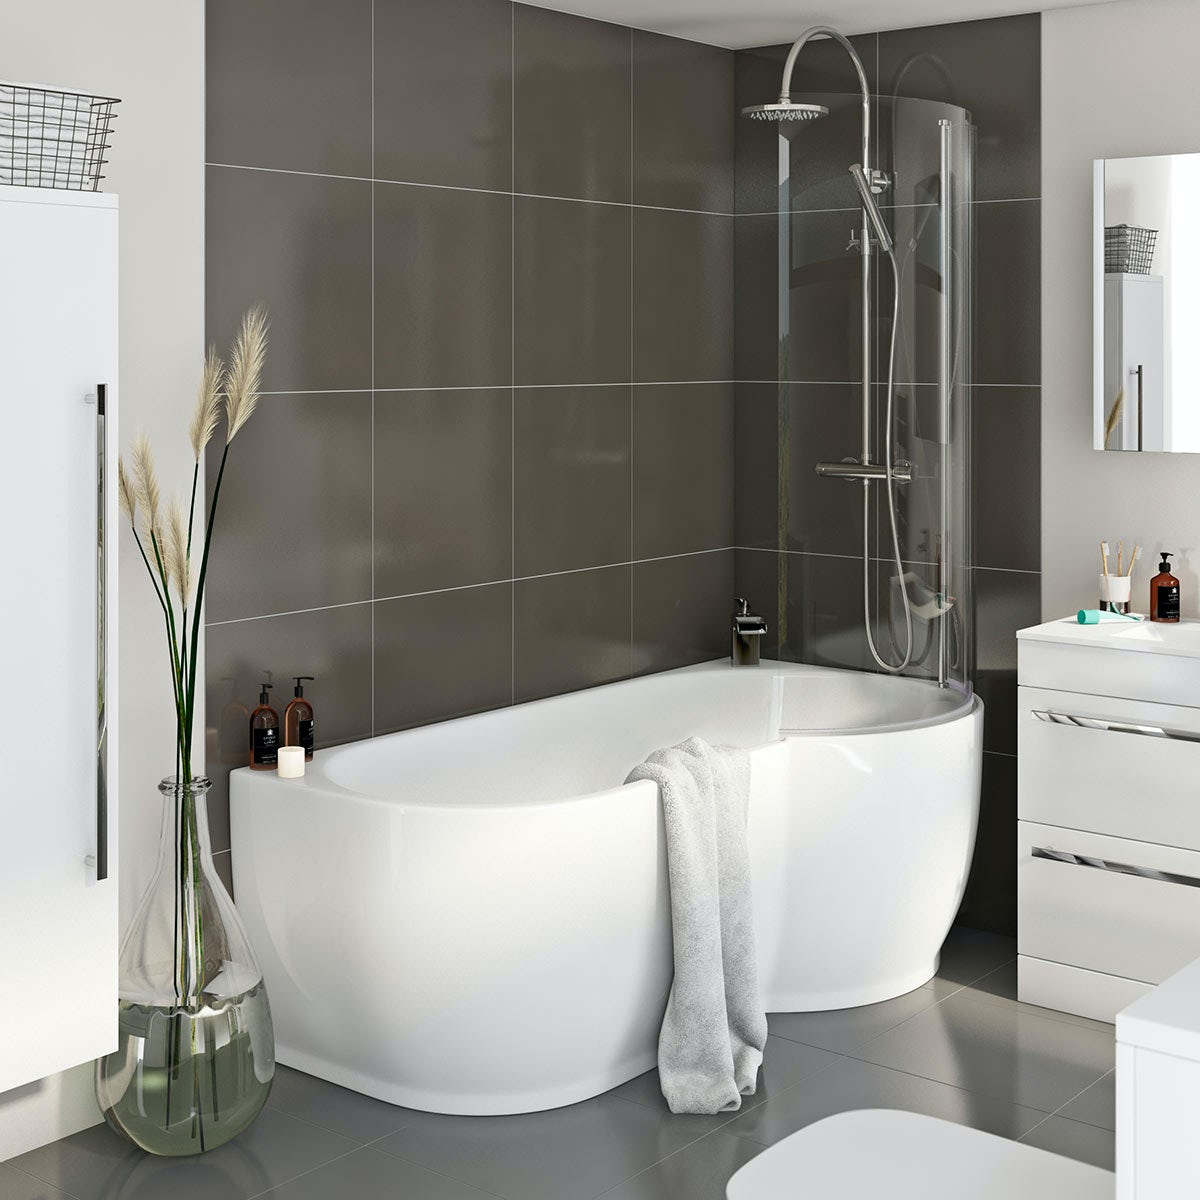 Freestanding Shower Bath amp 6mm Screen RH Click to zoom. Freestanding Shower Bath